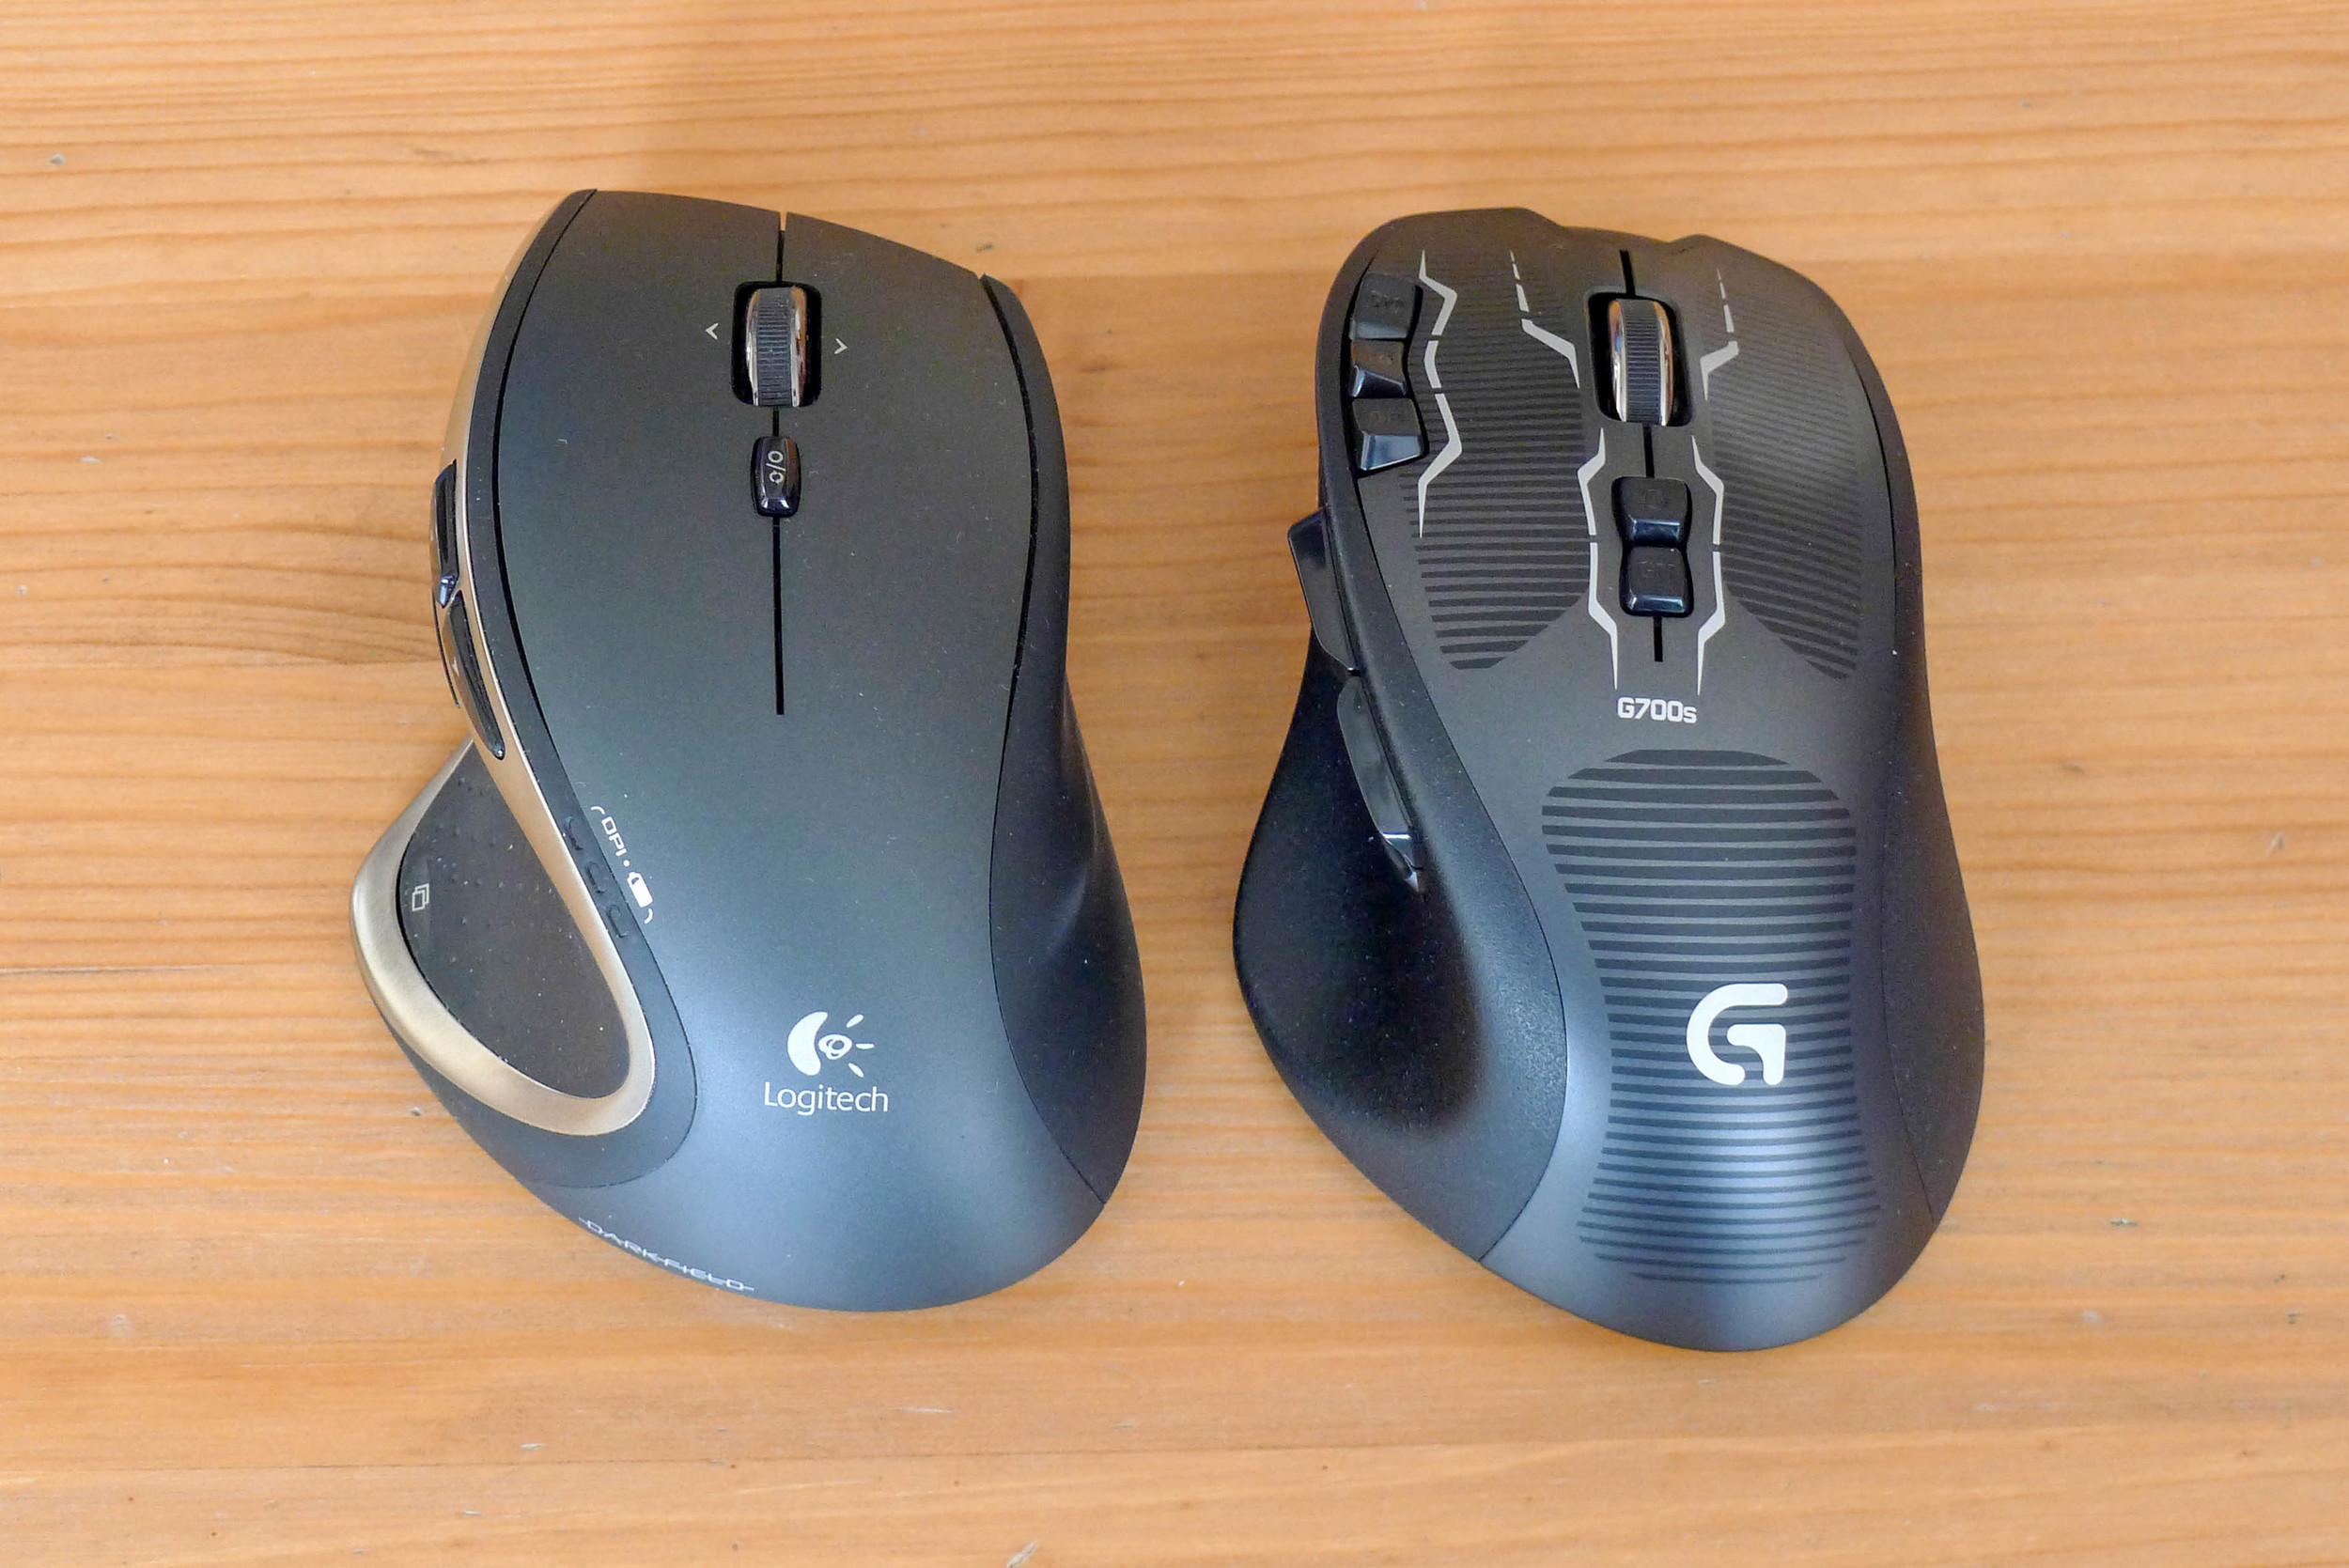 Logitech G700s gaming mouse review - jason tsay